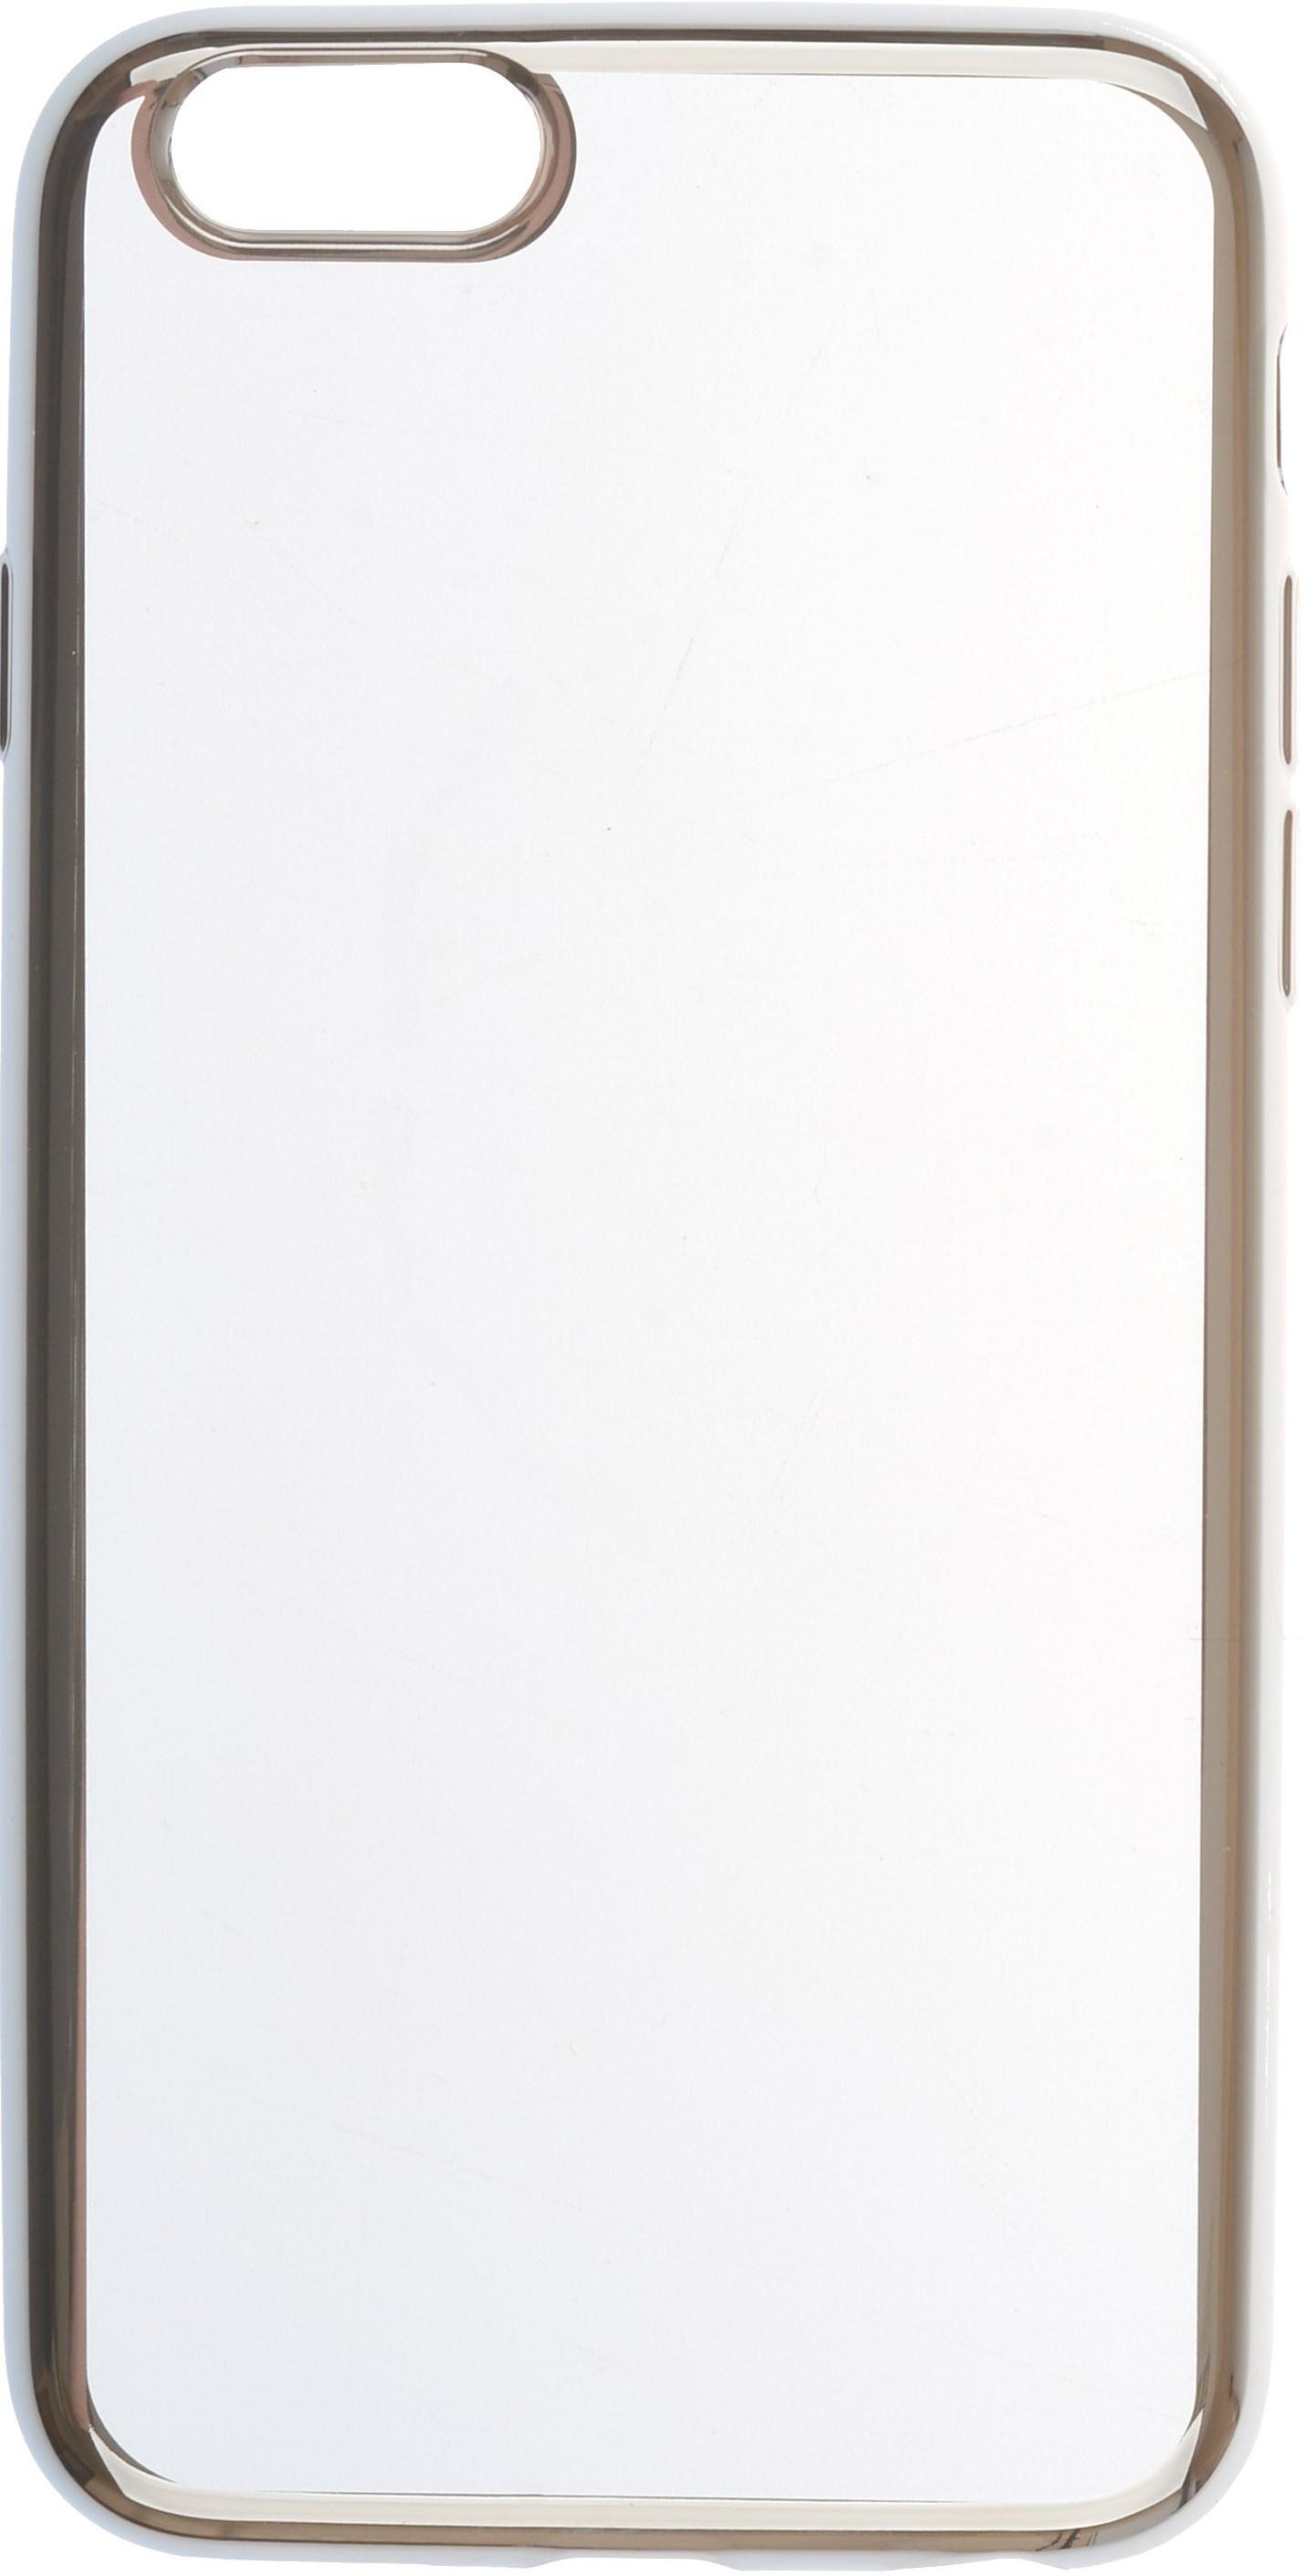 Чехол для сотового телефона skinBOX Silicone chrome border, 4630042524934, серебристый чехол для asus zenfone go zb500kg skinbox 4people silicone chrome border case темно серебристый